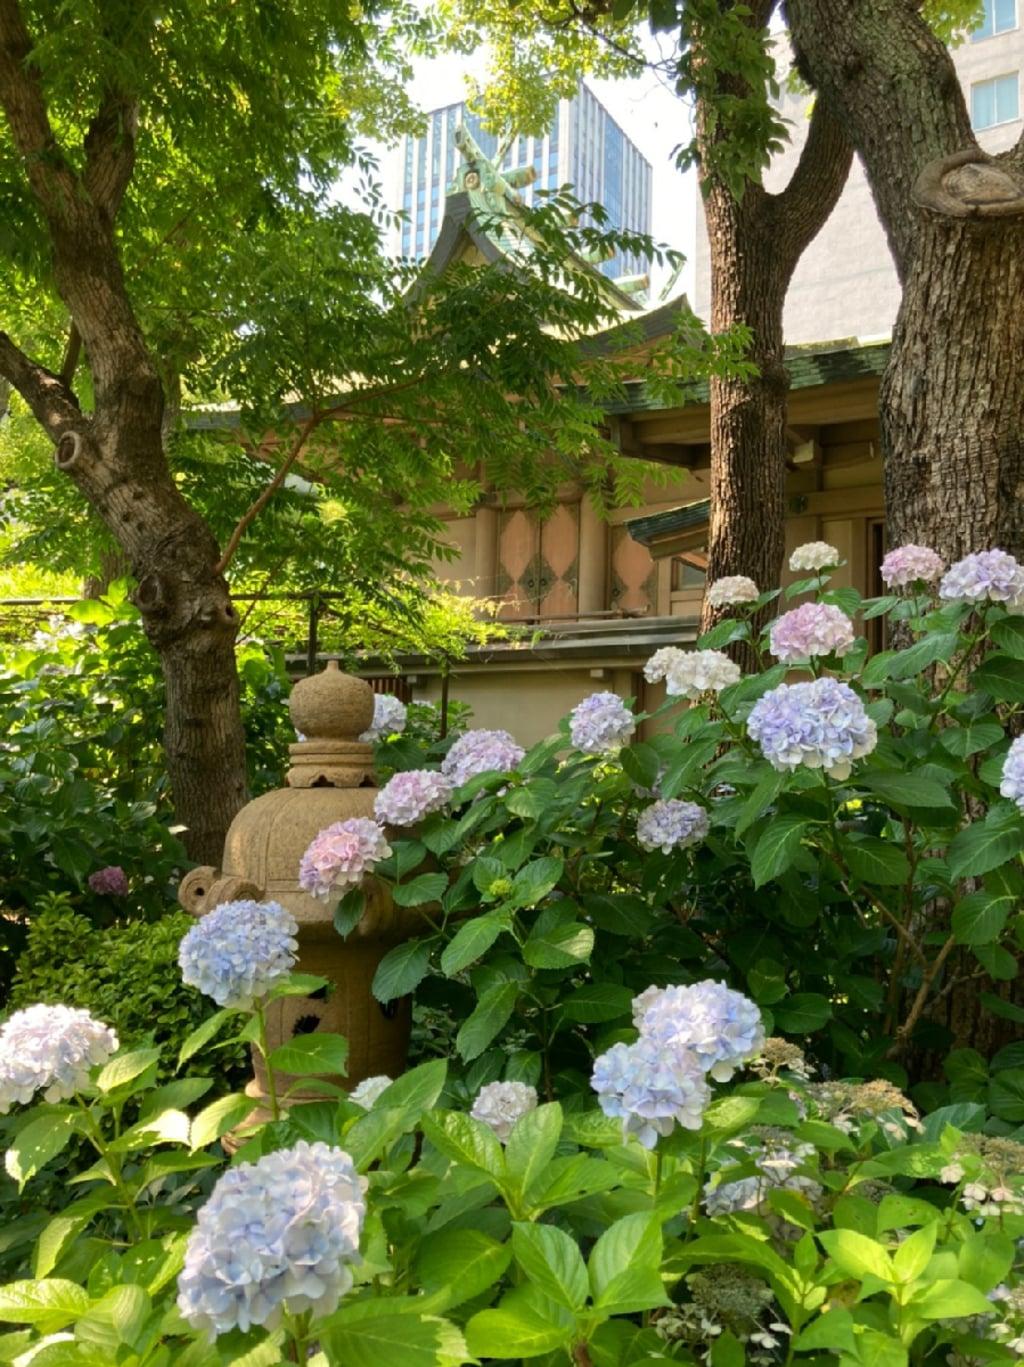 坐摩神社の庭園